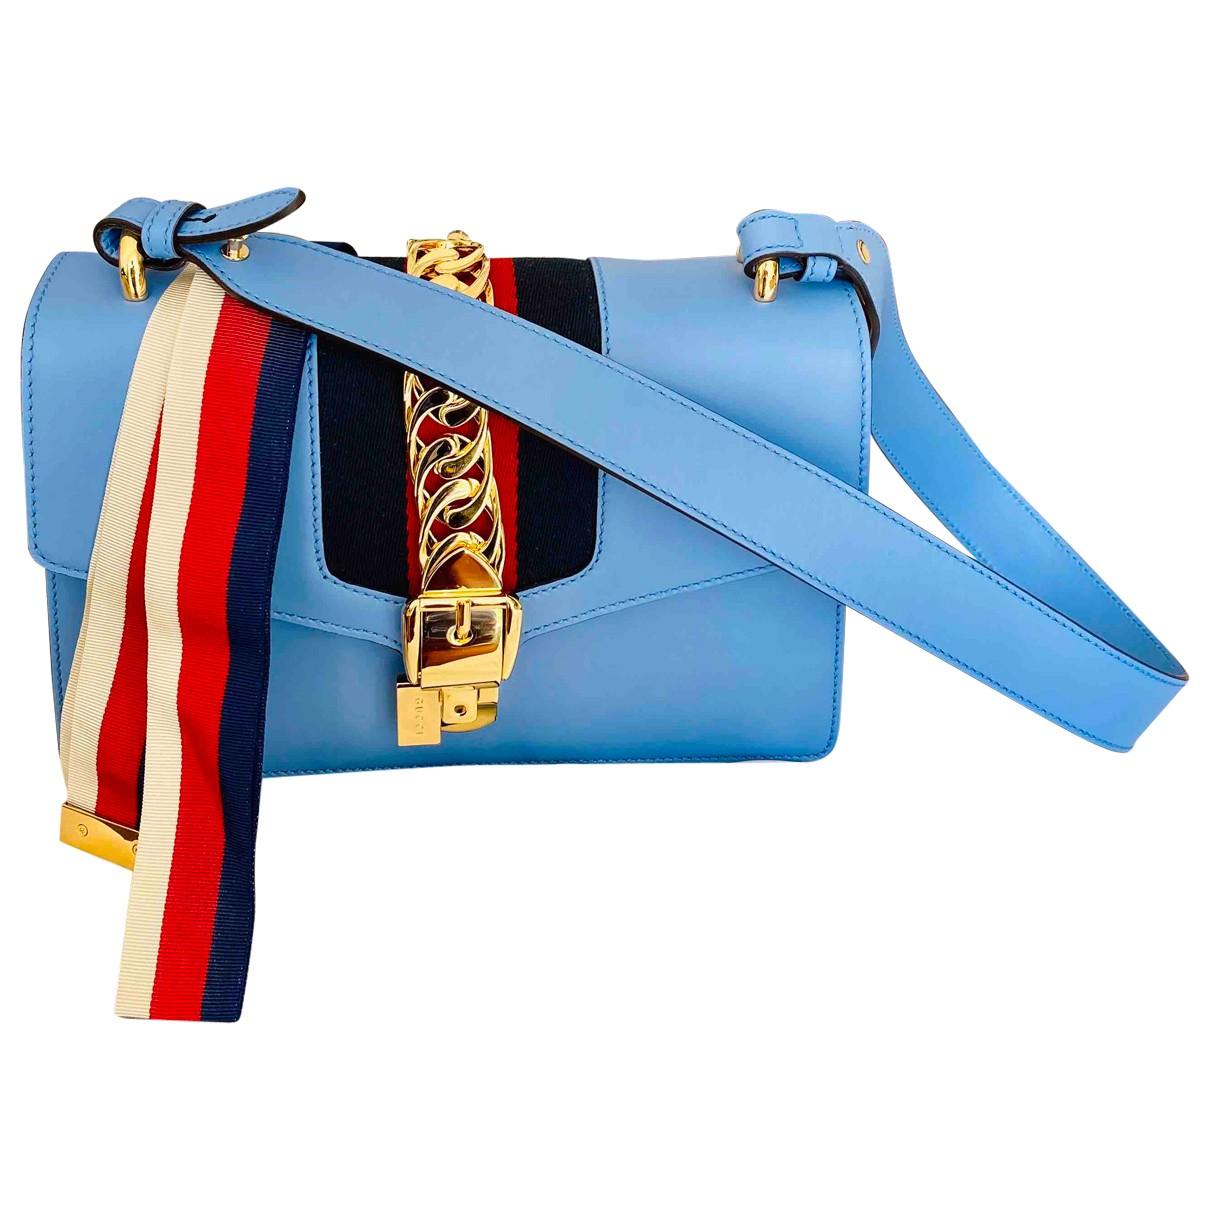 Gucci - Sac a main Sylvie pour femme en cuir - bleu